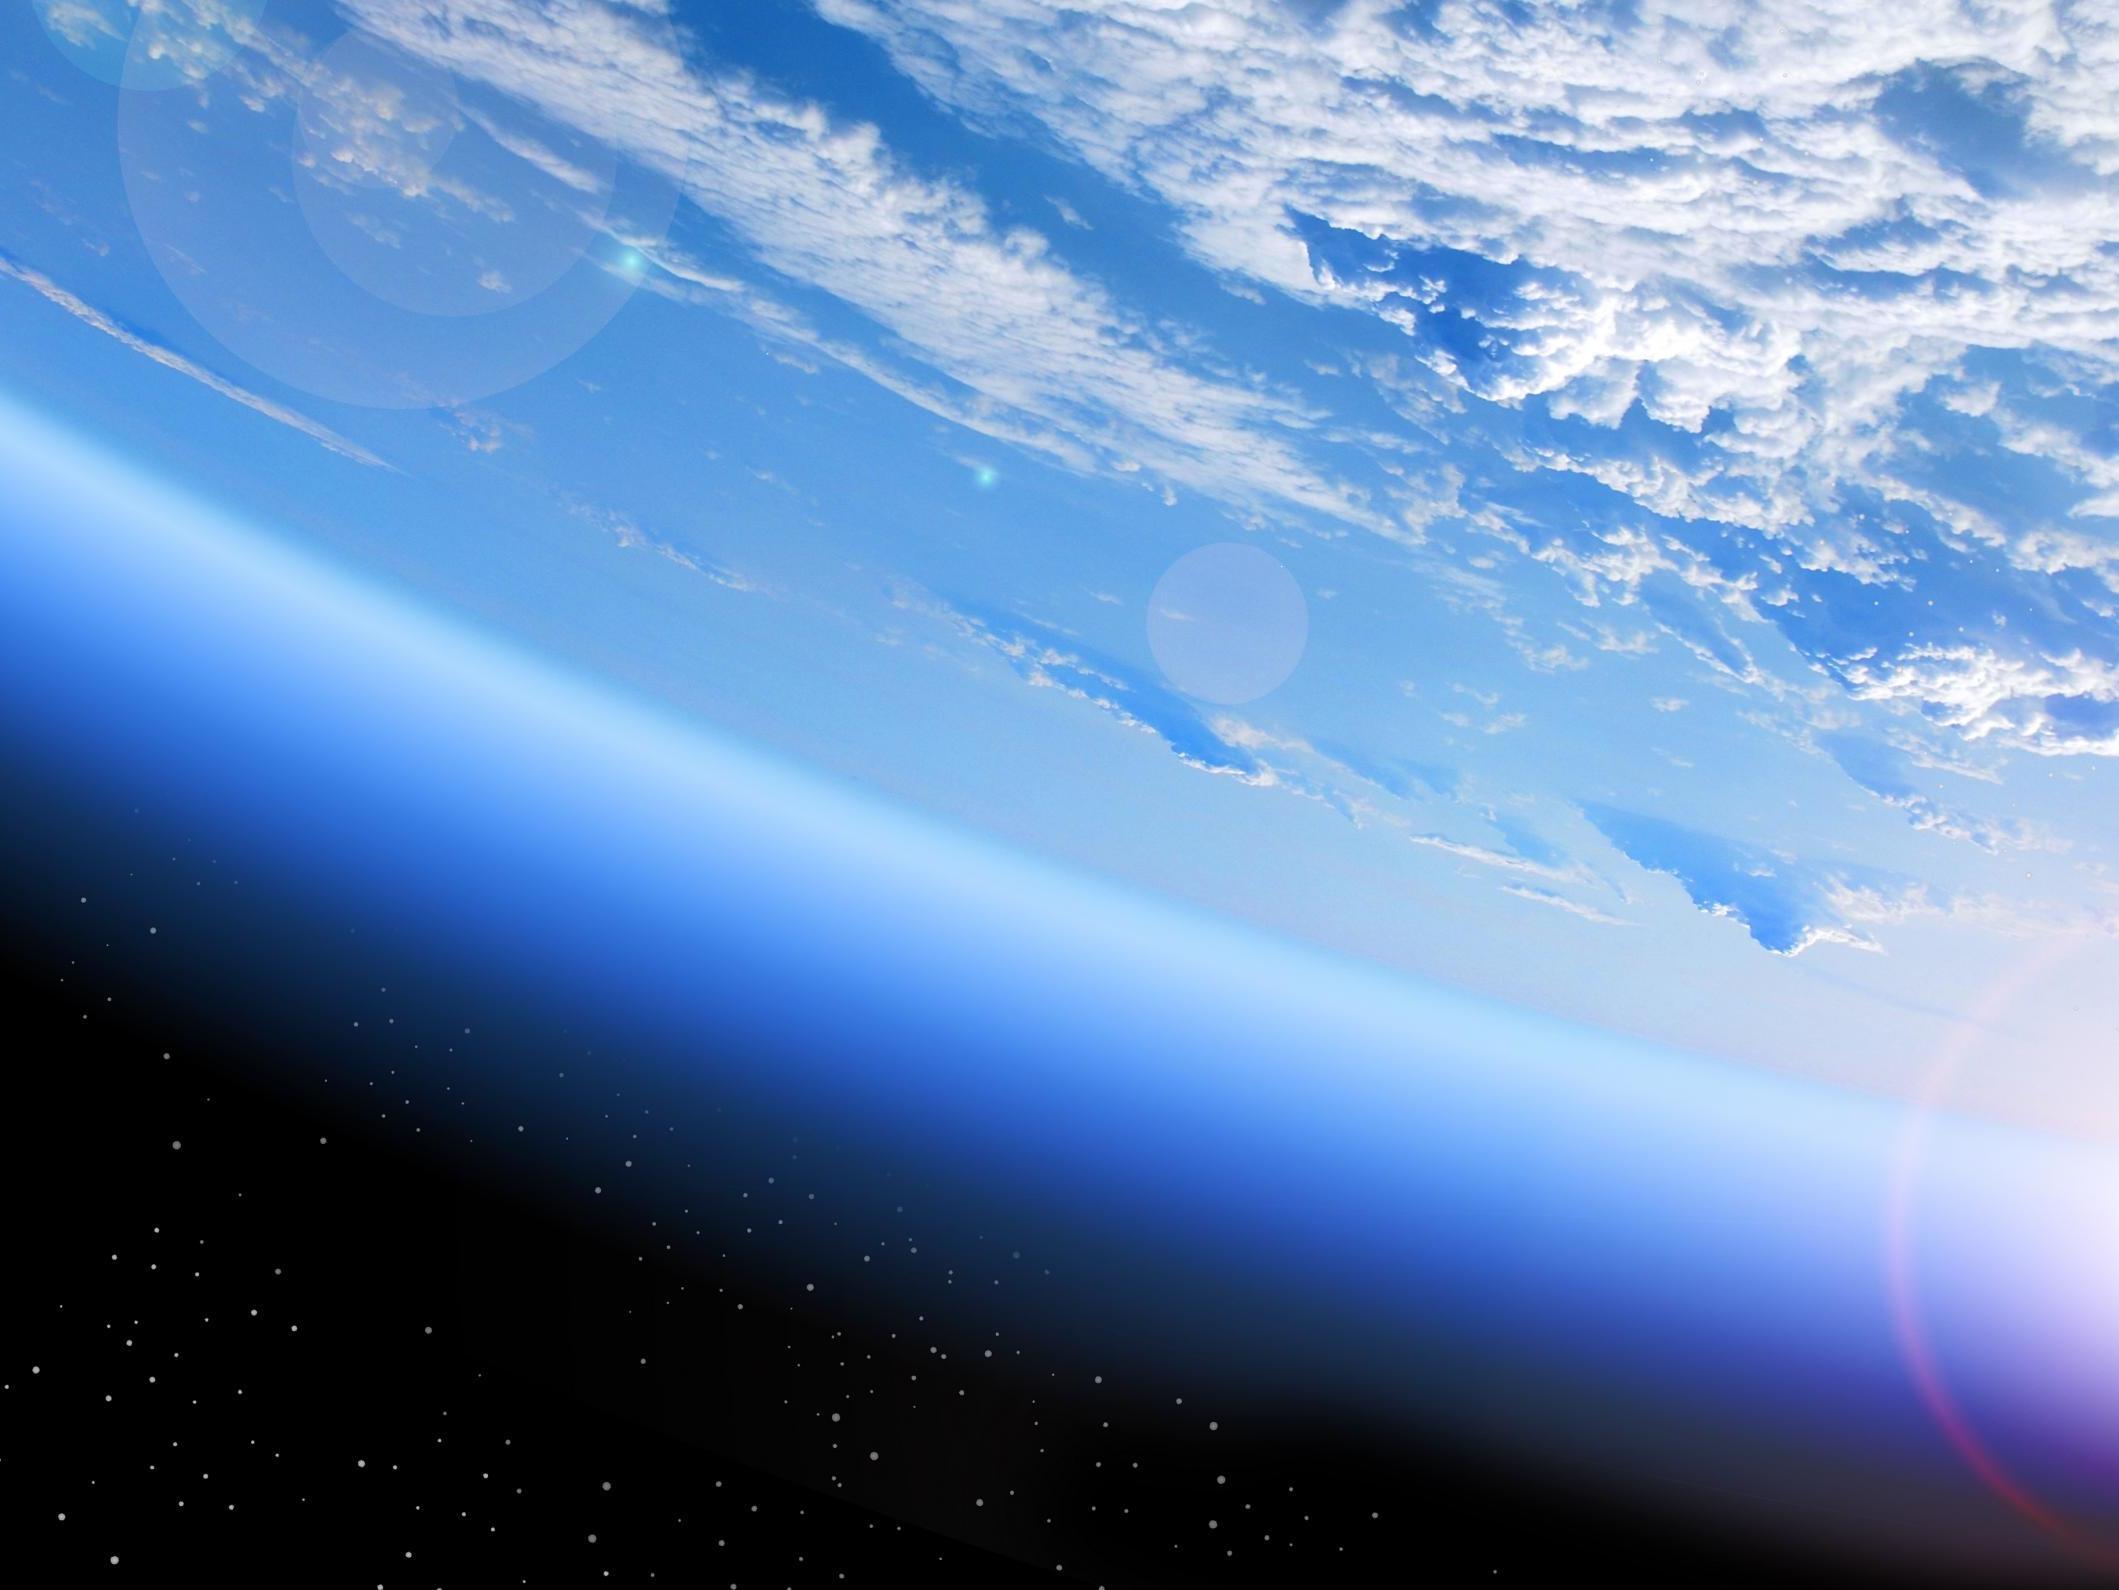 Anti-global warming atmospheric spraying programme 'possible' say engineers